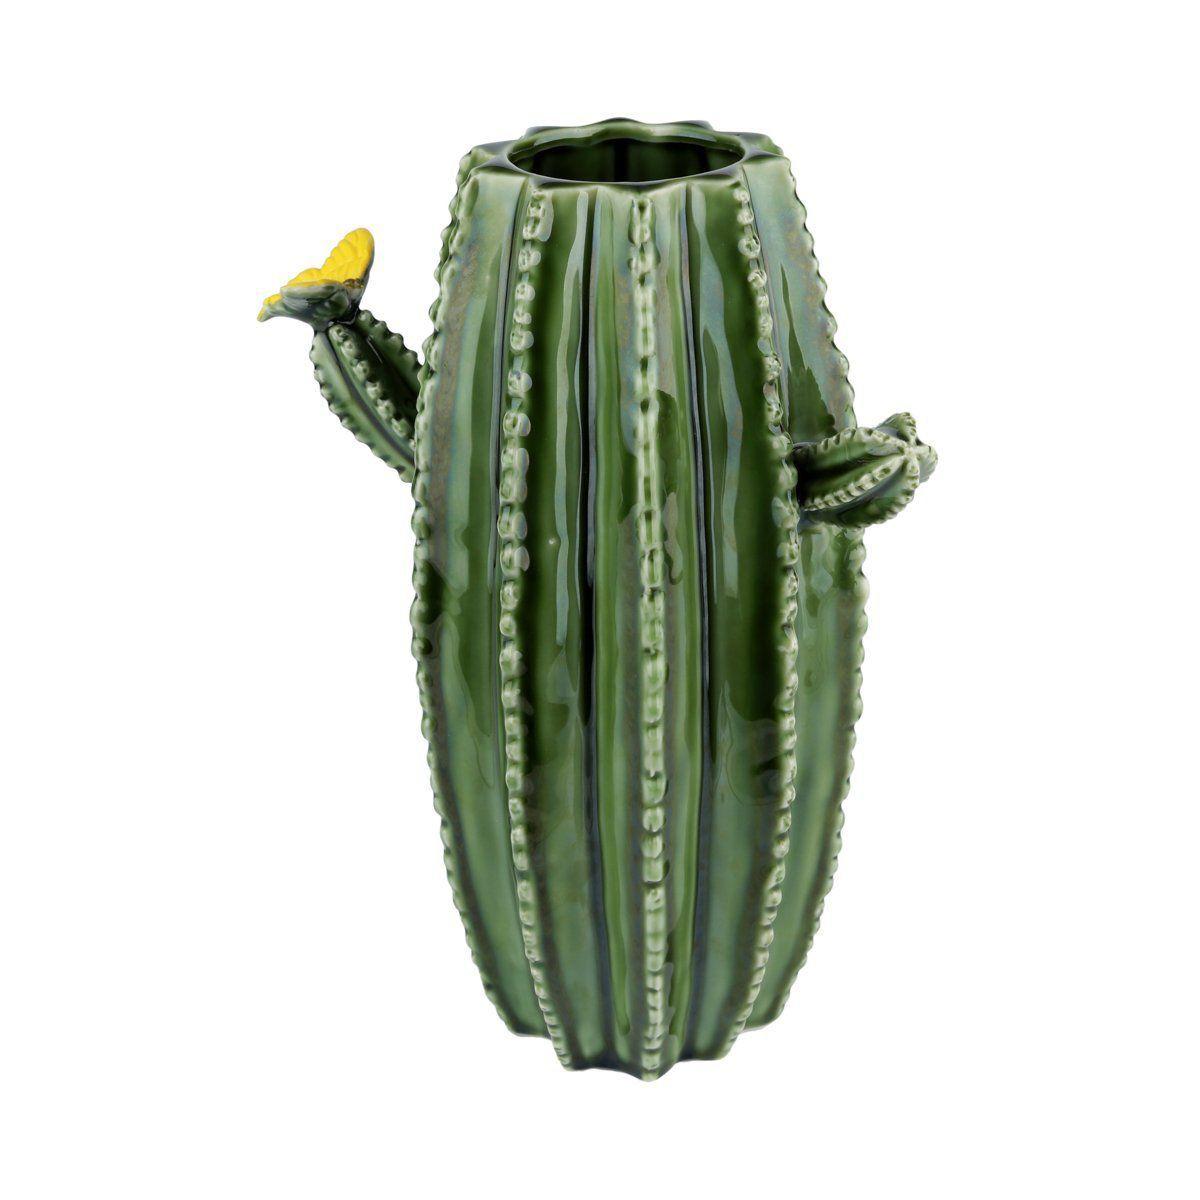 Vaso de Cerâmica Hedge Cactus Verde 25cm x 20cm - 40396